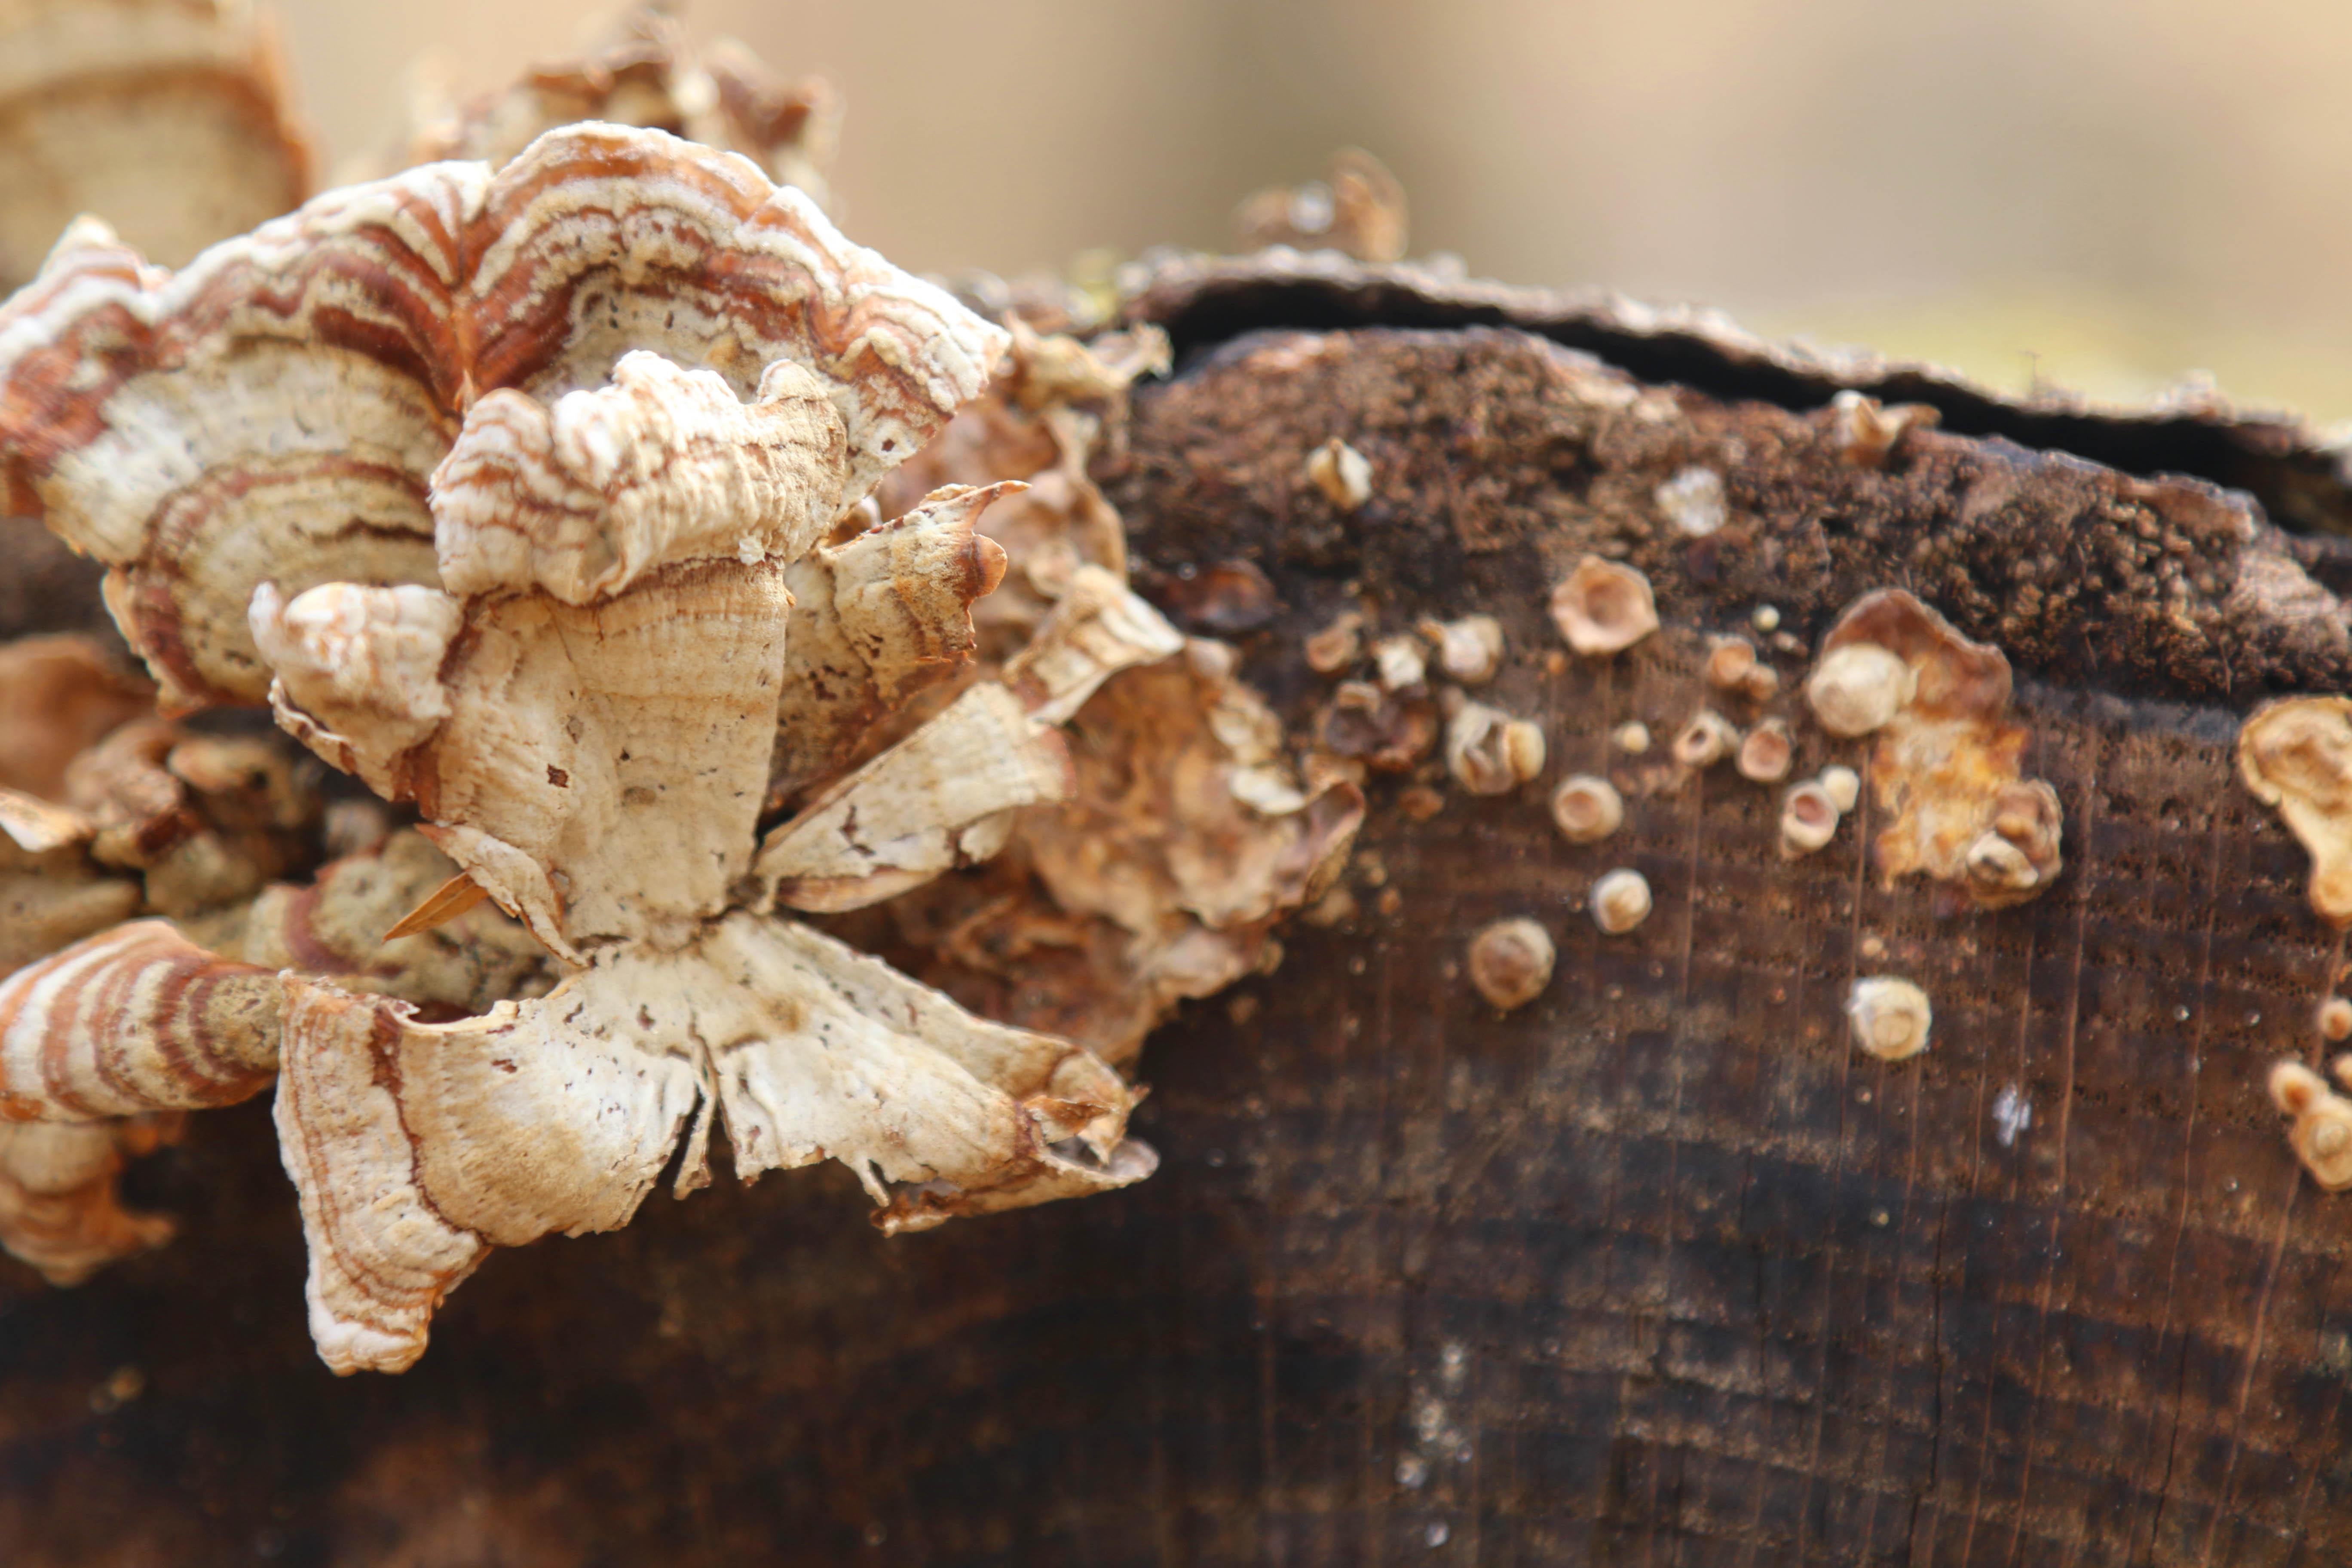 Orange mushrooms growing on log